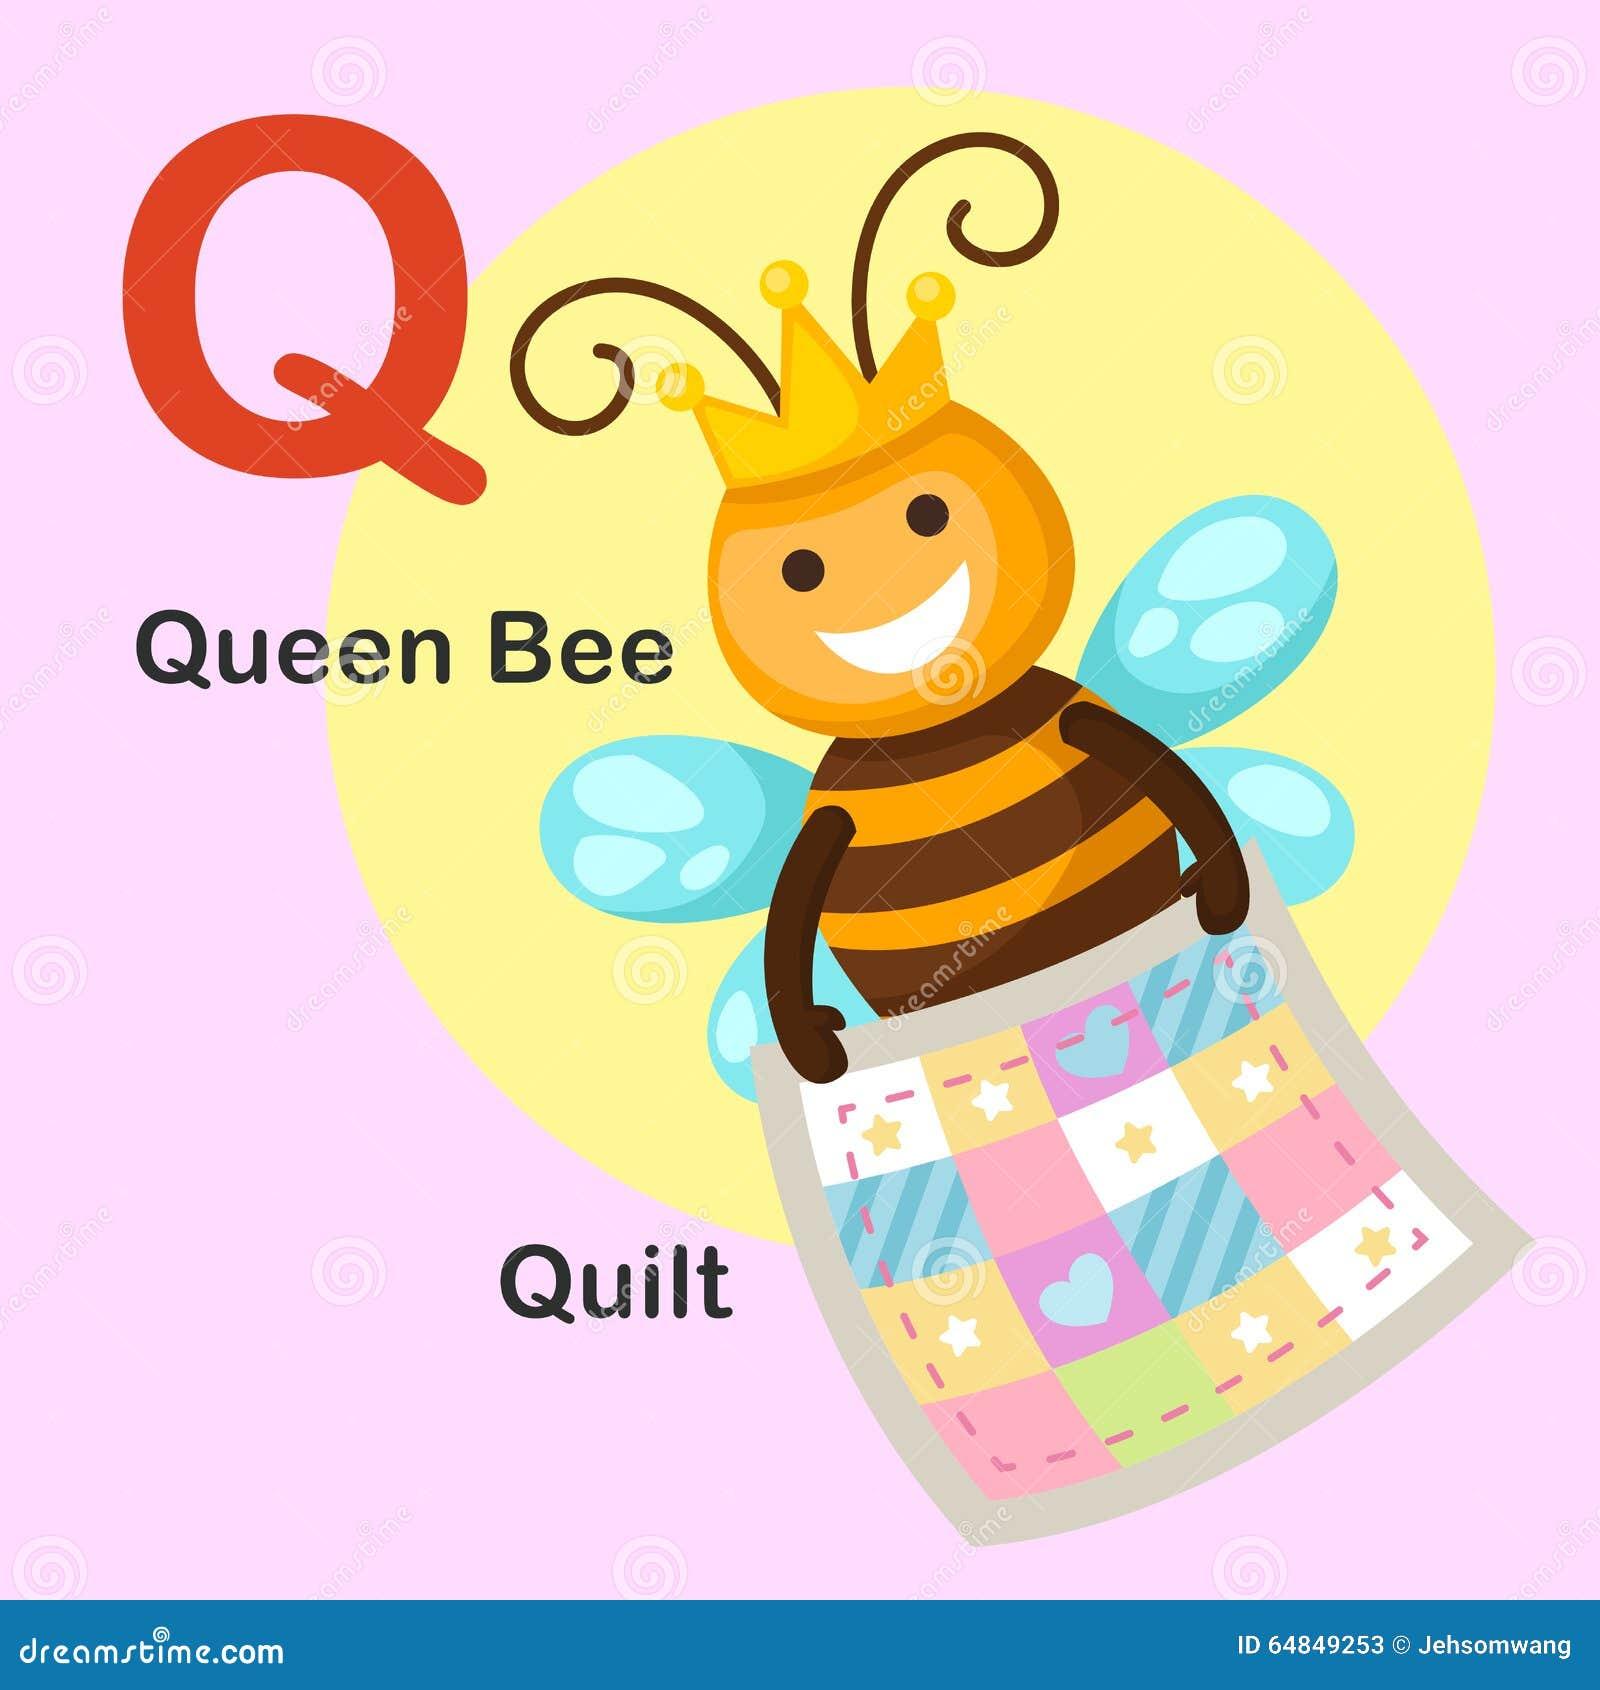 Illustration Animal Alphabet Letter Q-Quilt,queen Bee Illustration ... : q for quilt - Adamdwight.com